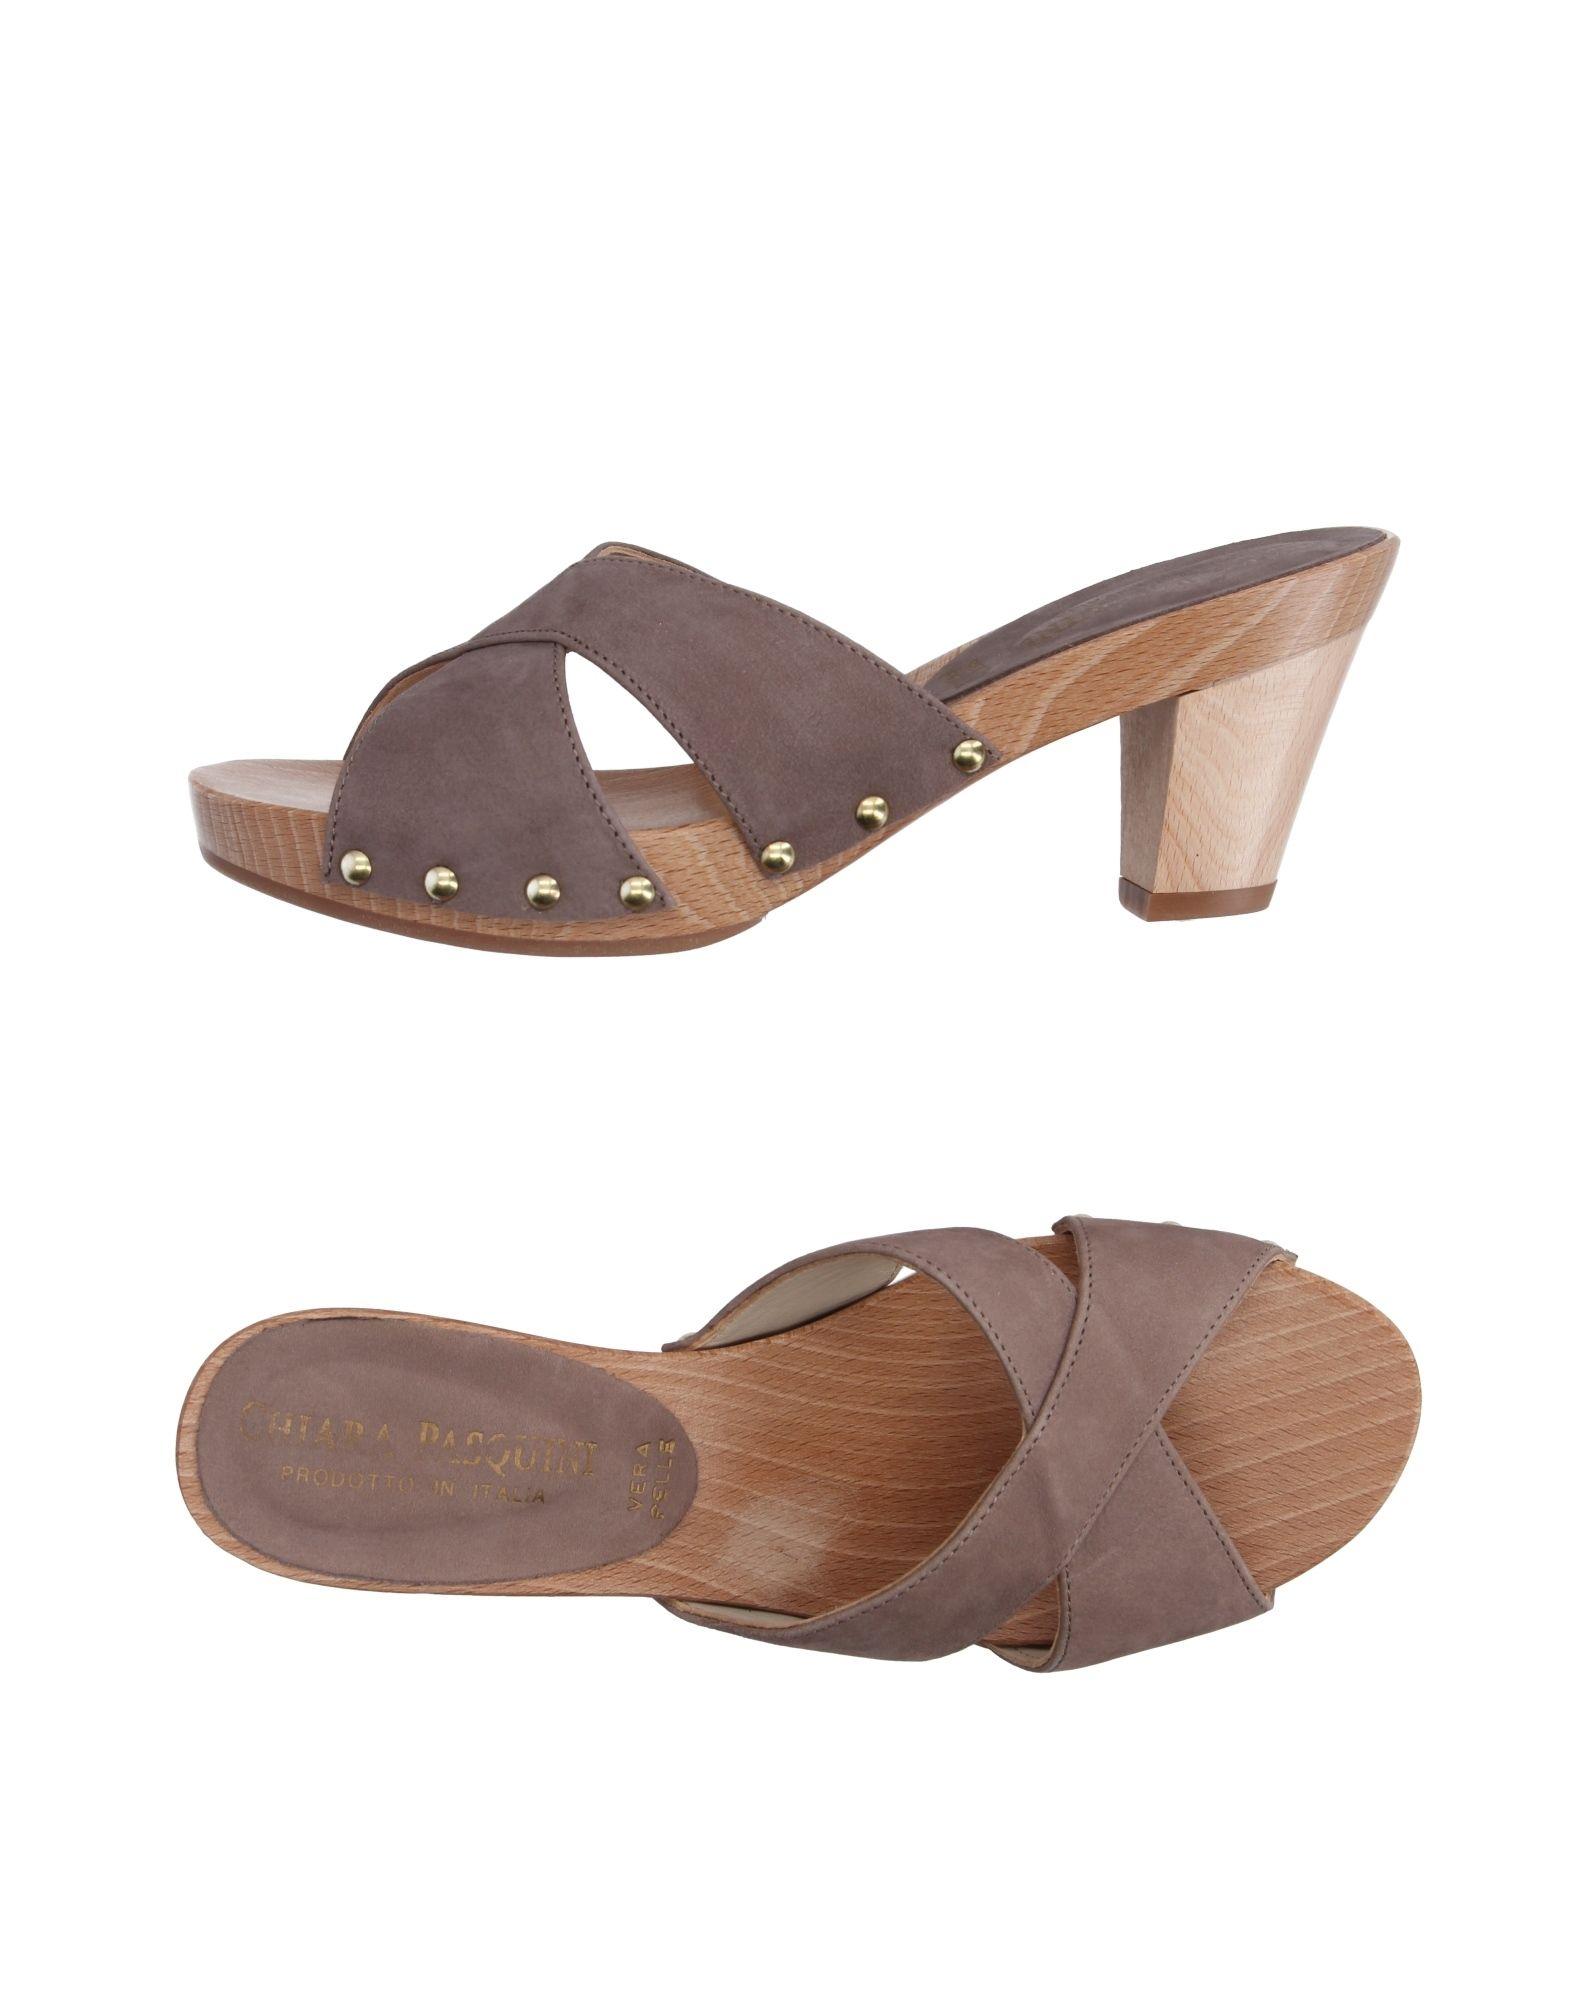 Chiara Pasquini Pantoletten Qualität Damen  11196727SX Gute Qualität Pantoletten beliebte Schuhe 31b651